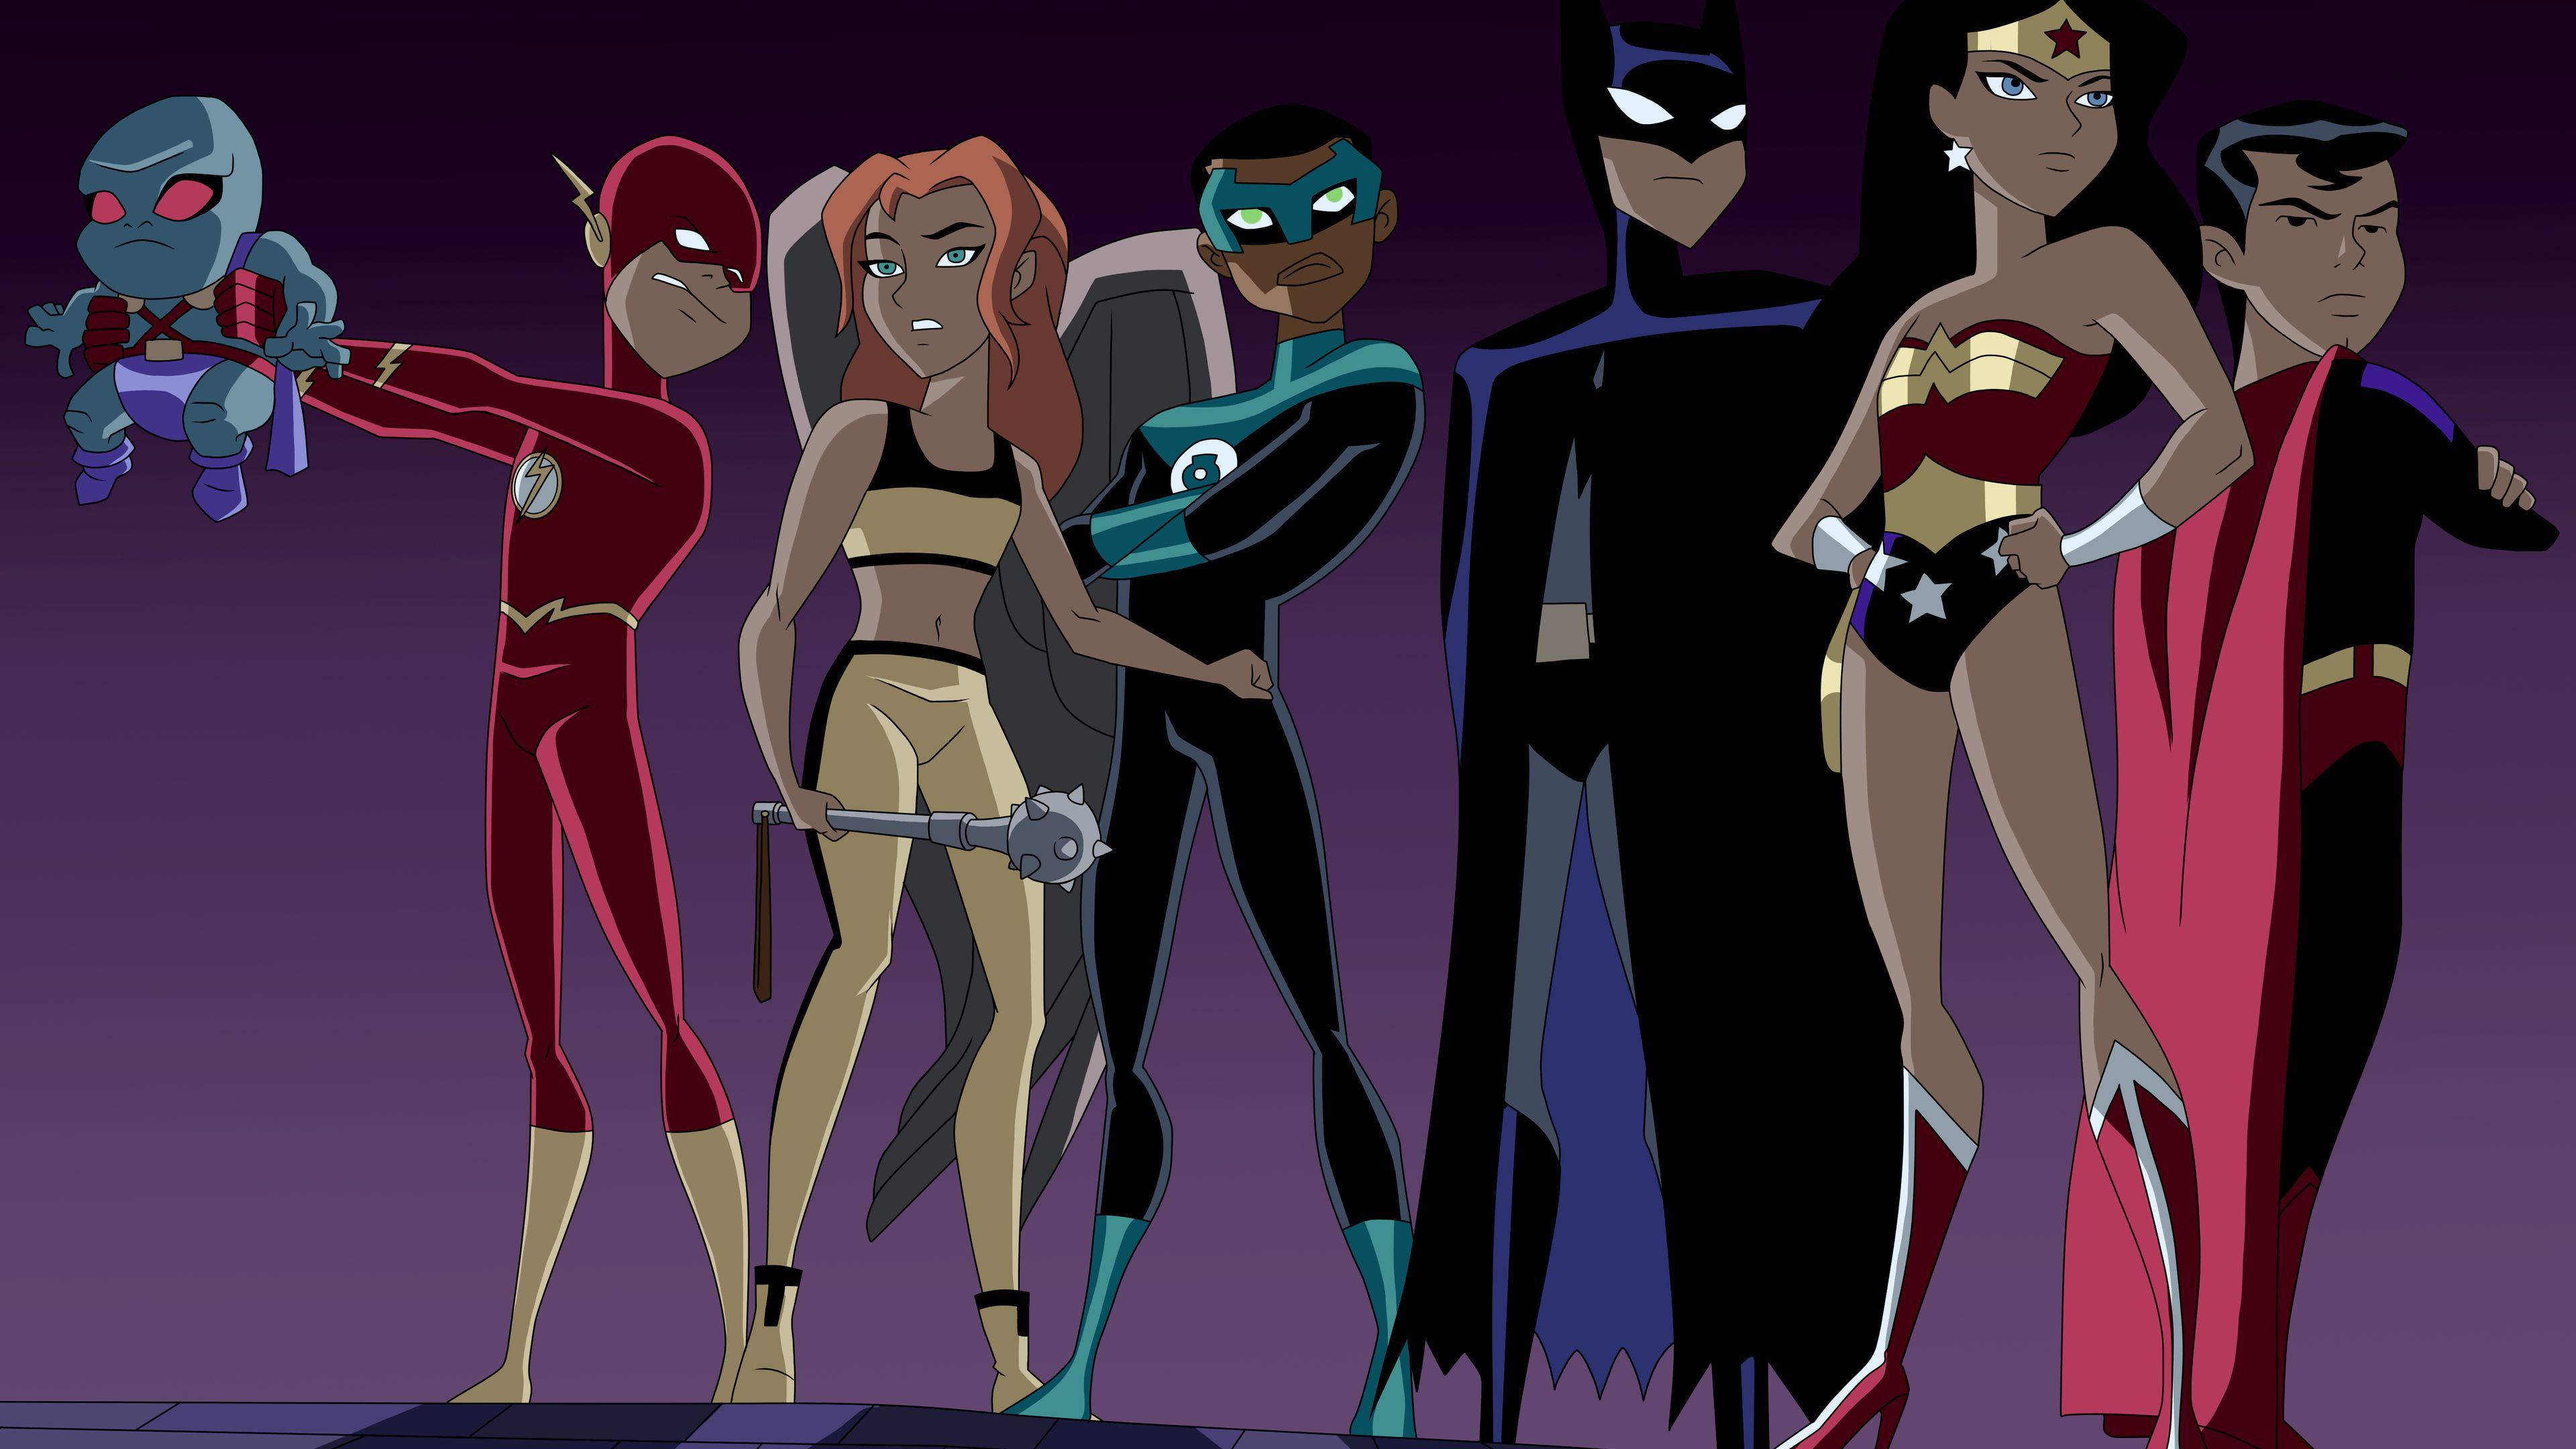 Junior League 4k Wallpaper Wonder Woman Wallpapers Superman Wallpapers Superheroes Wallpapers Justice L Justice League Justice League Animated Junior League